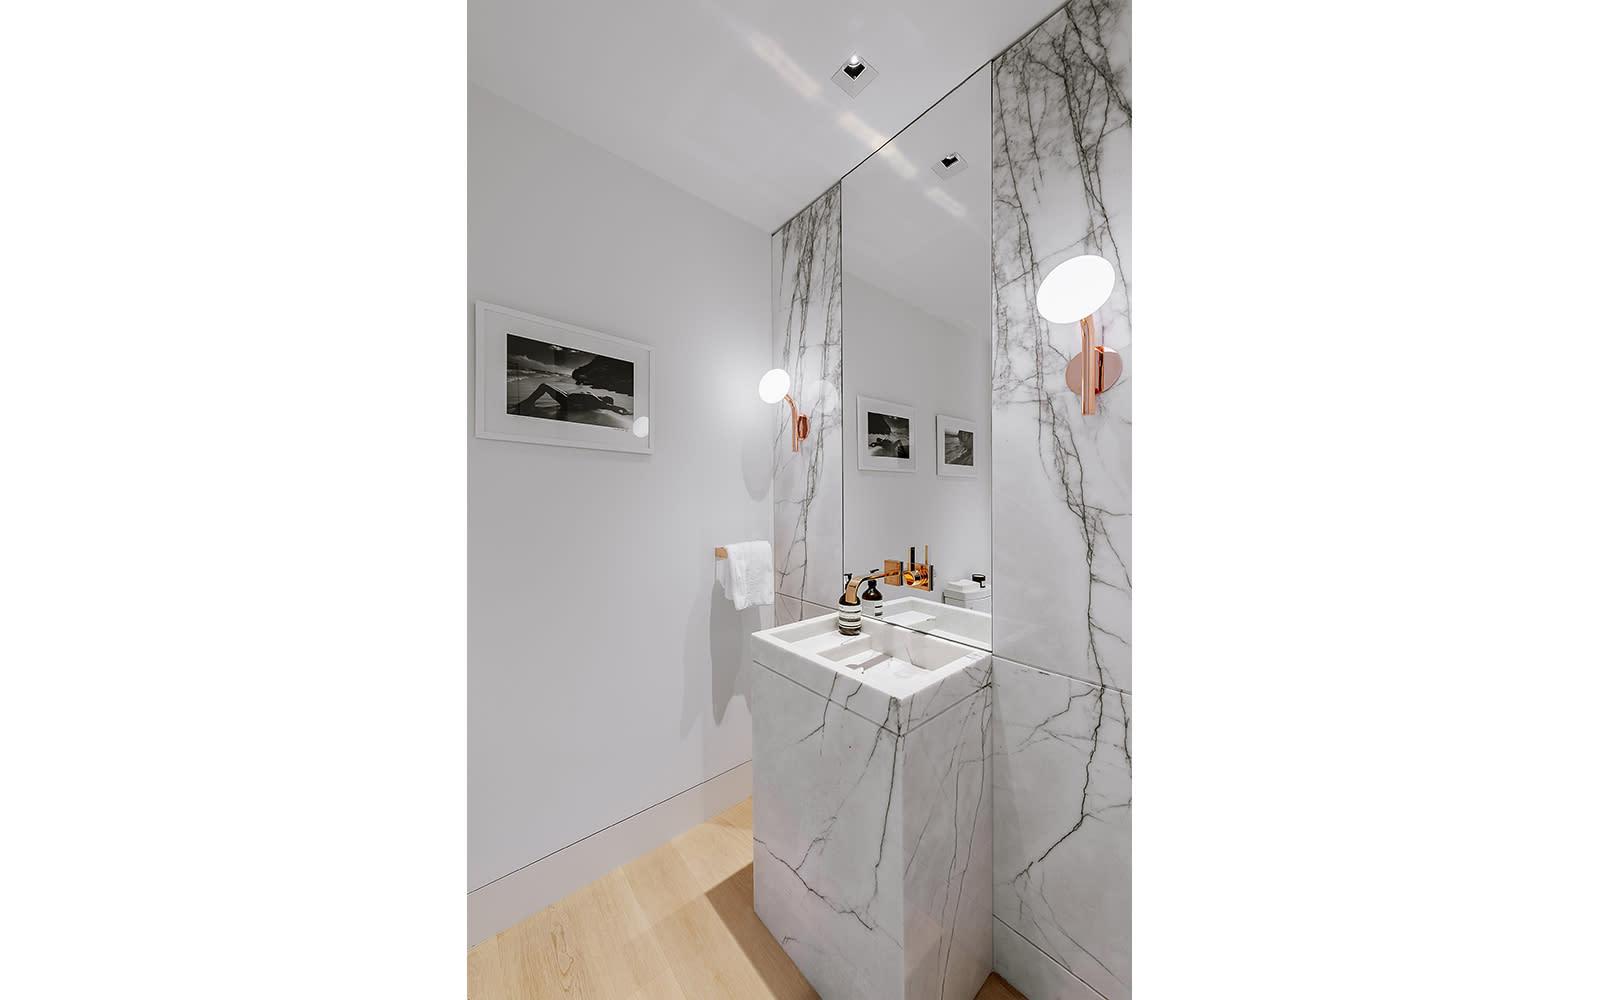 powder room with decorative rose gold scones inside a los angeles condominium